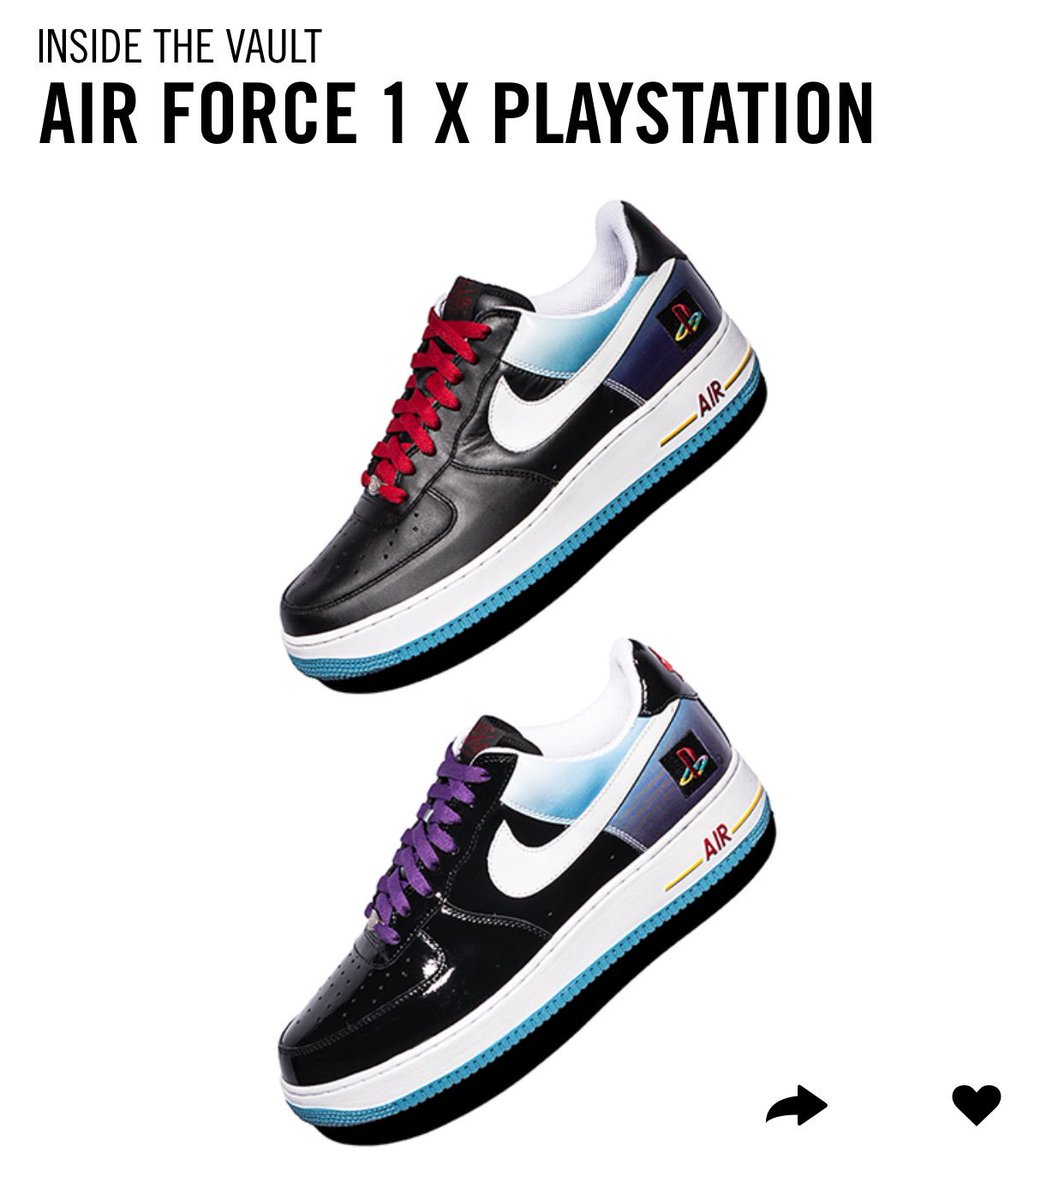 6da4abd0c86f Complex Sneakers on Twitter